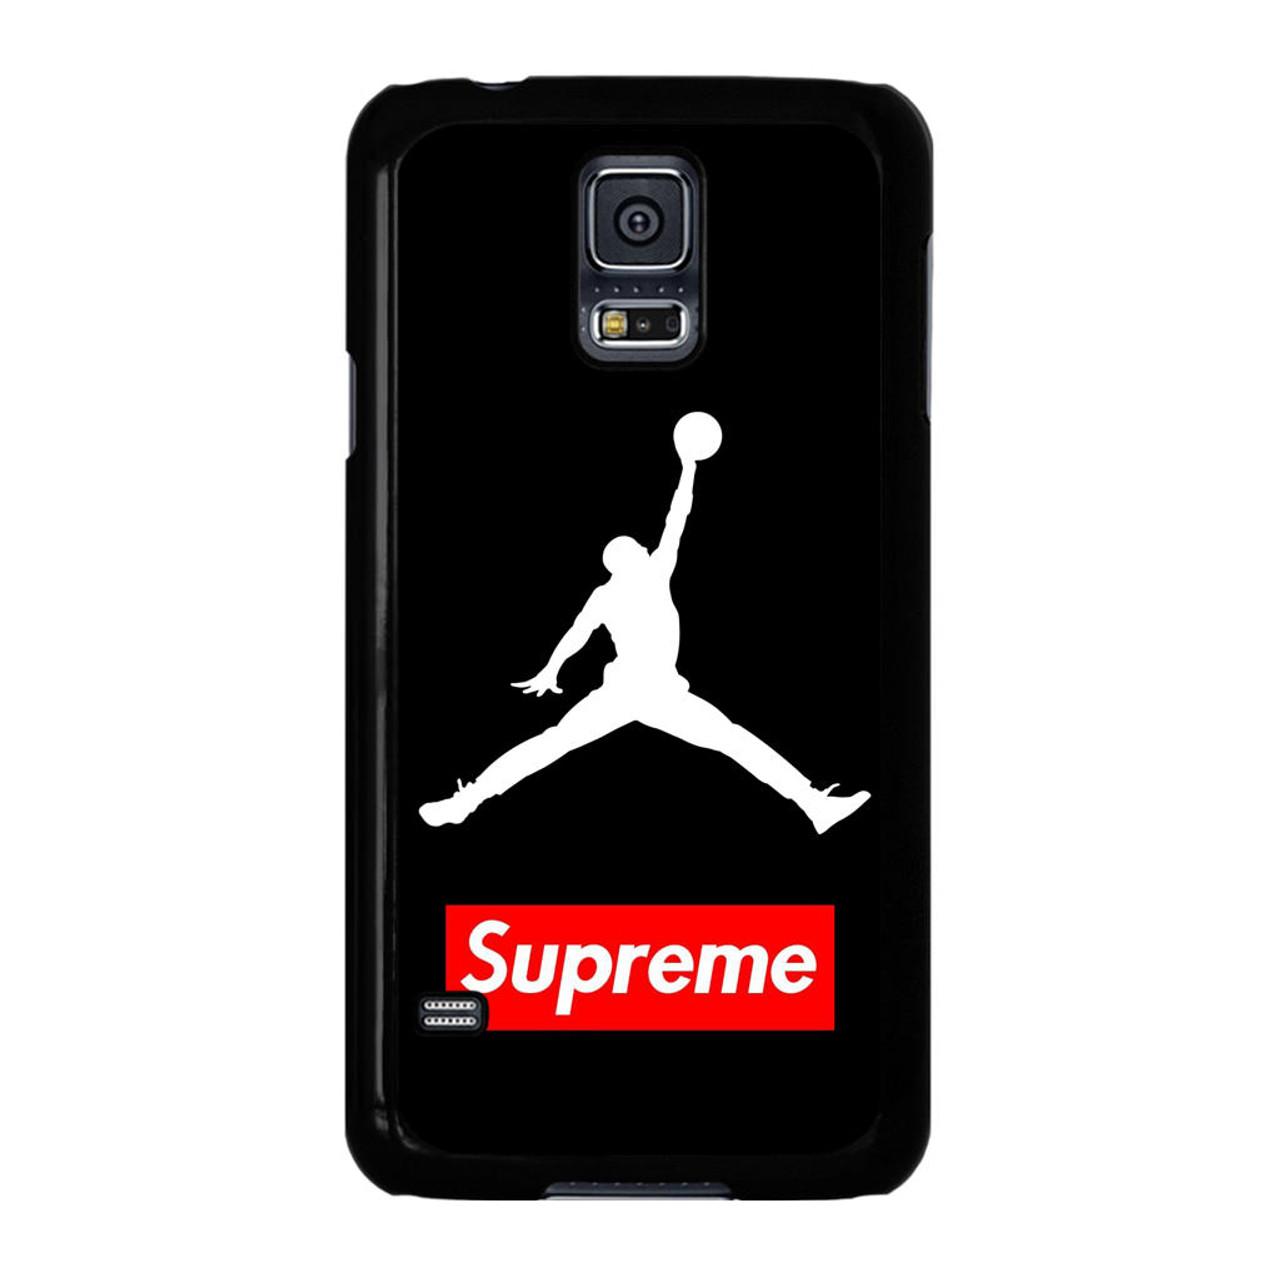 brand new c6b17 65b2d Supreme Air Jordan Samsung Galaxy S5 Case - CASESHUNTER